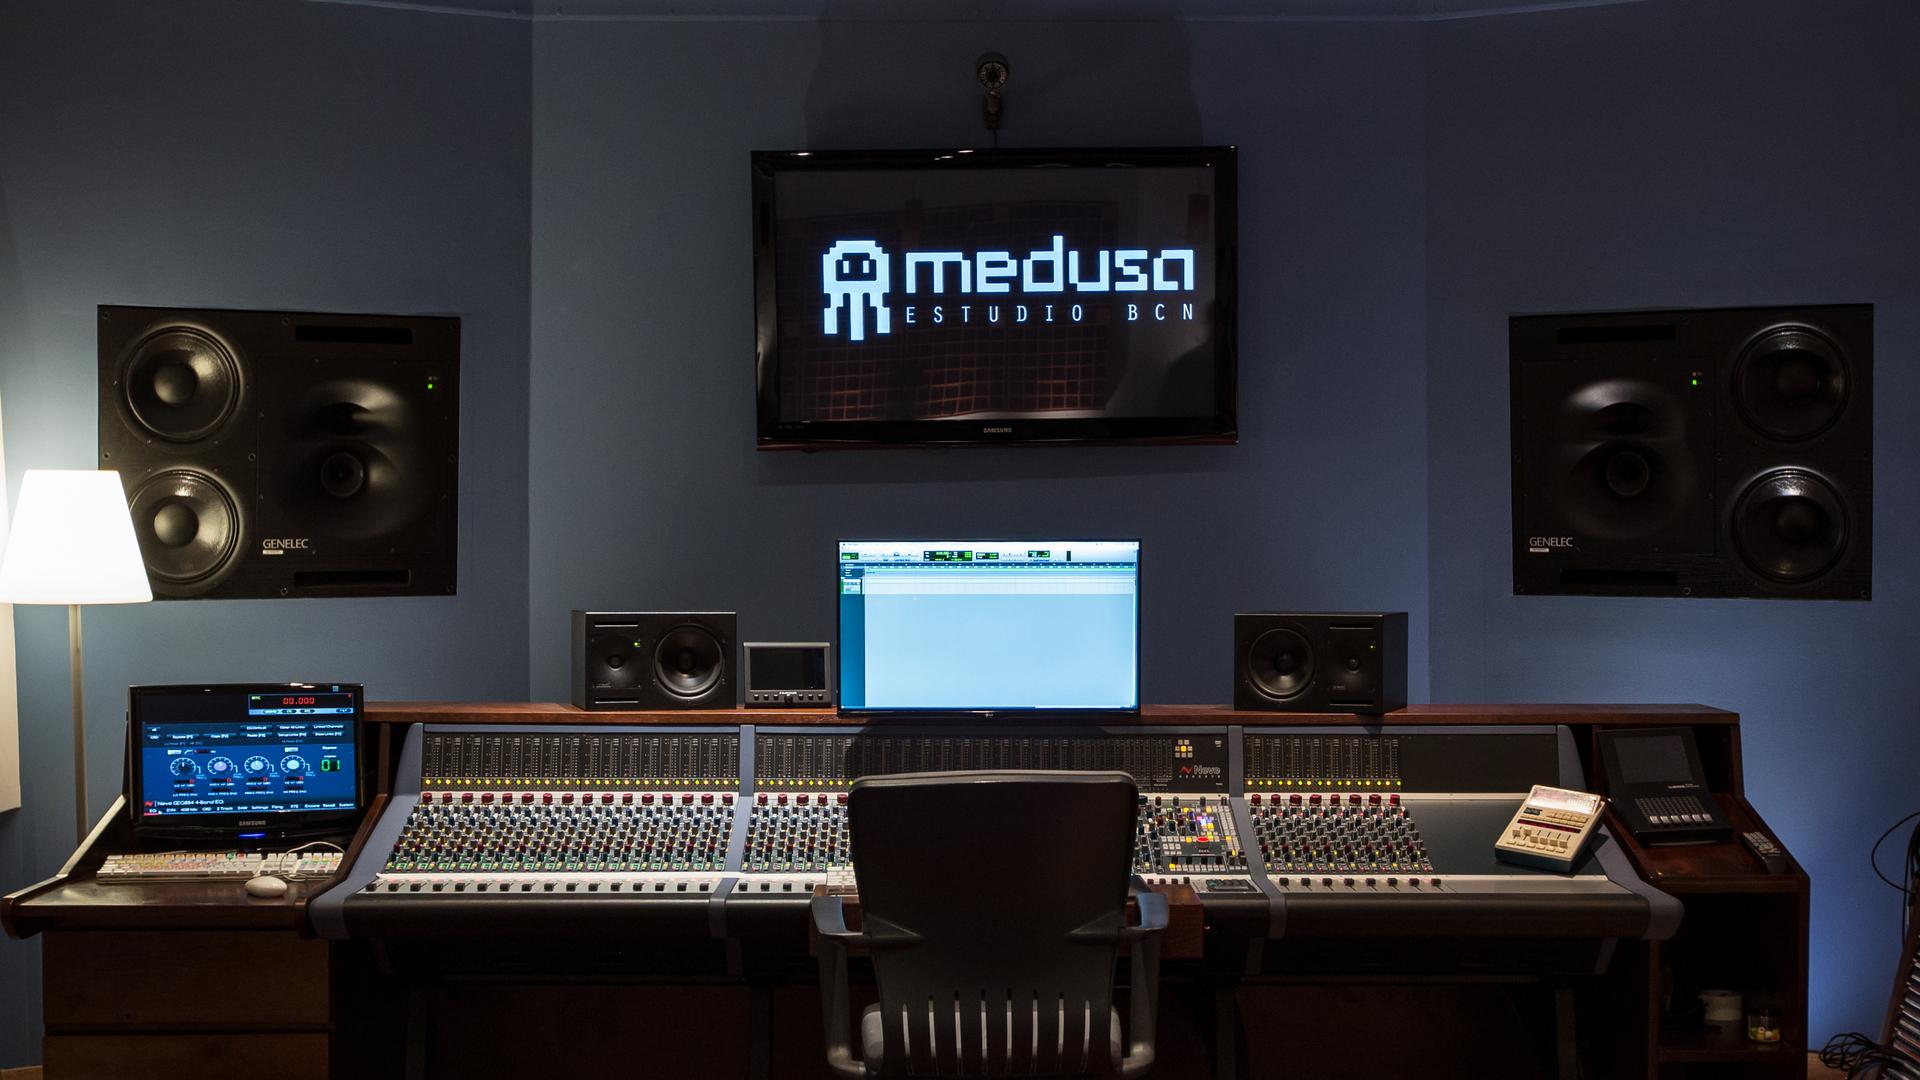 Medusa Estudio Barcelona